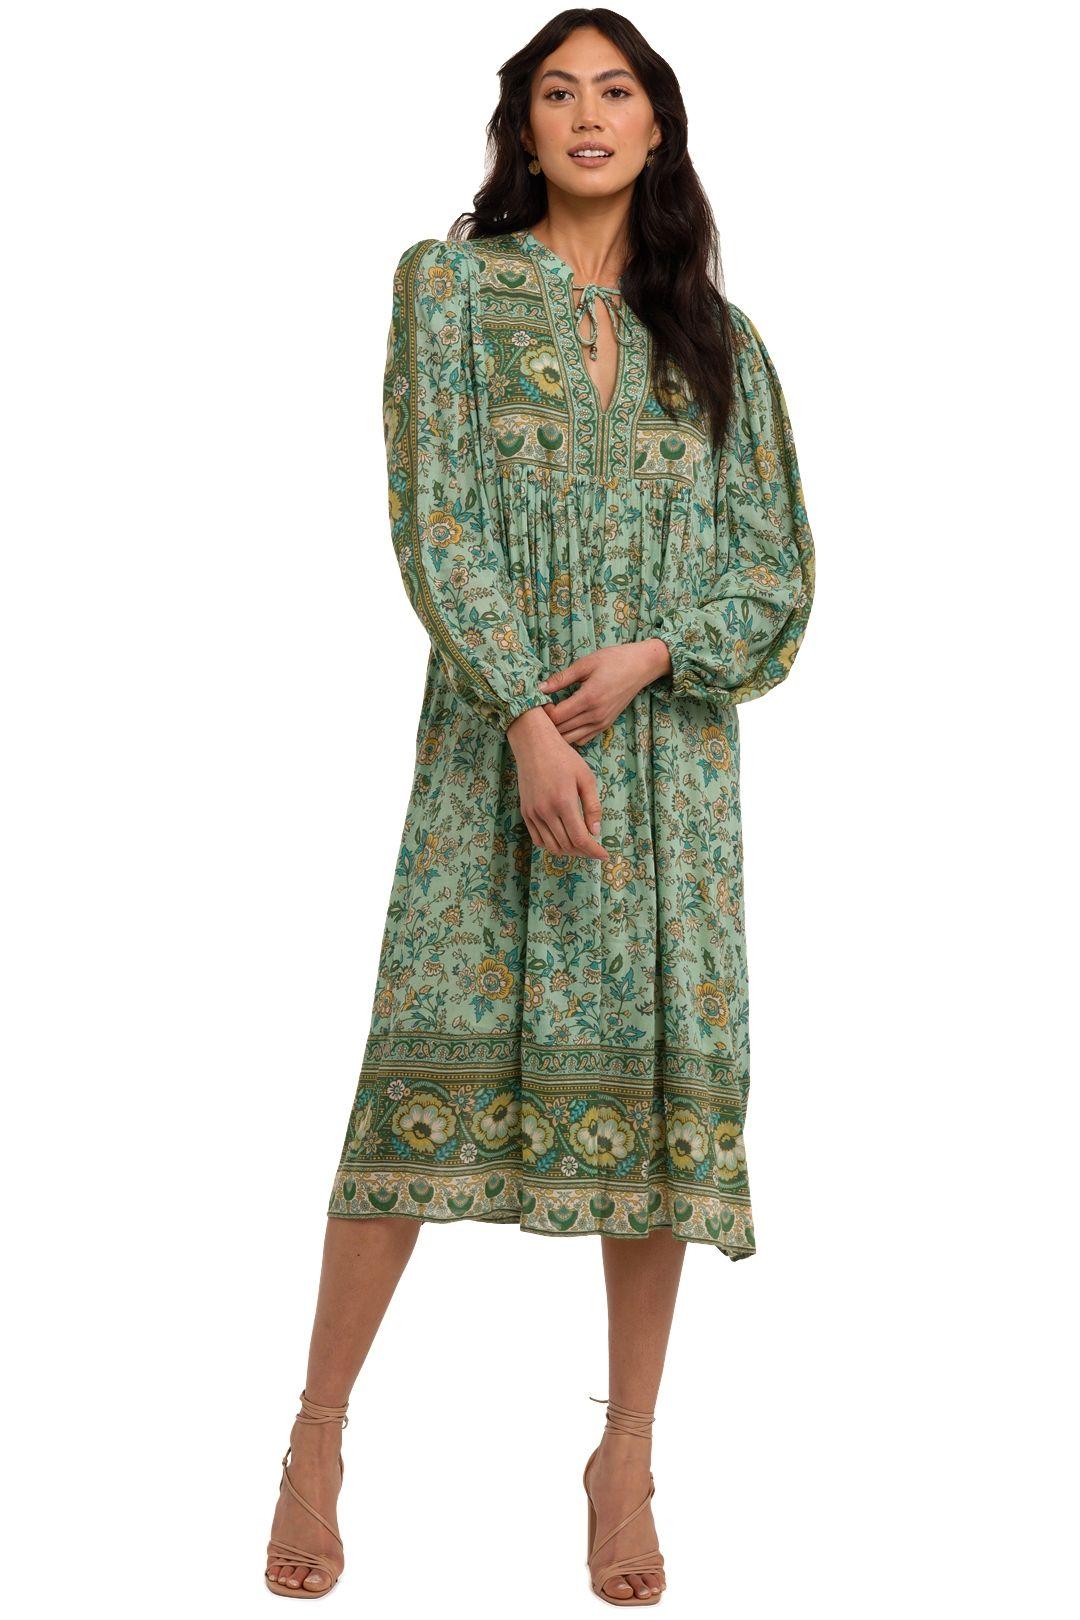 Spell Folk Song Boho Dress Sage